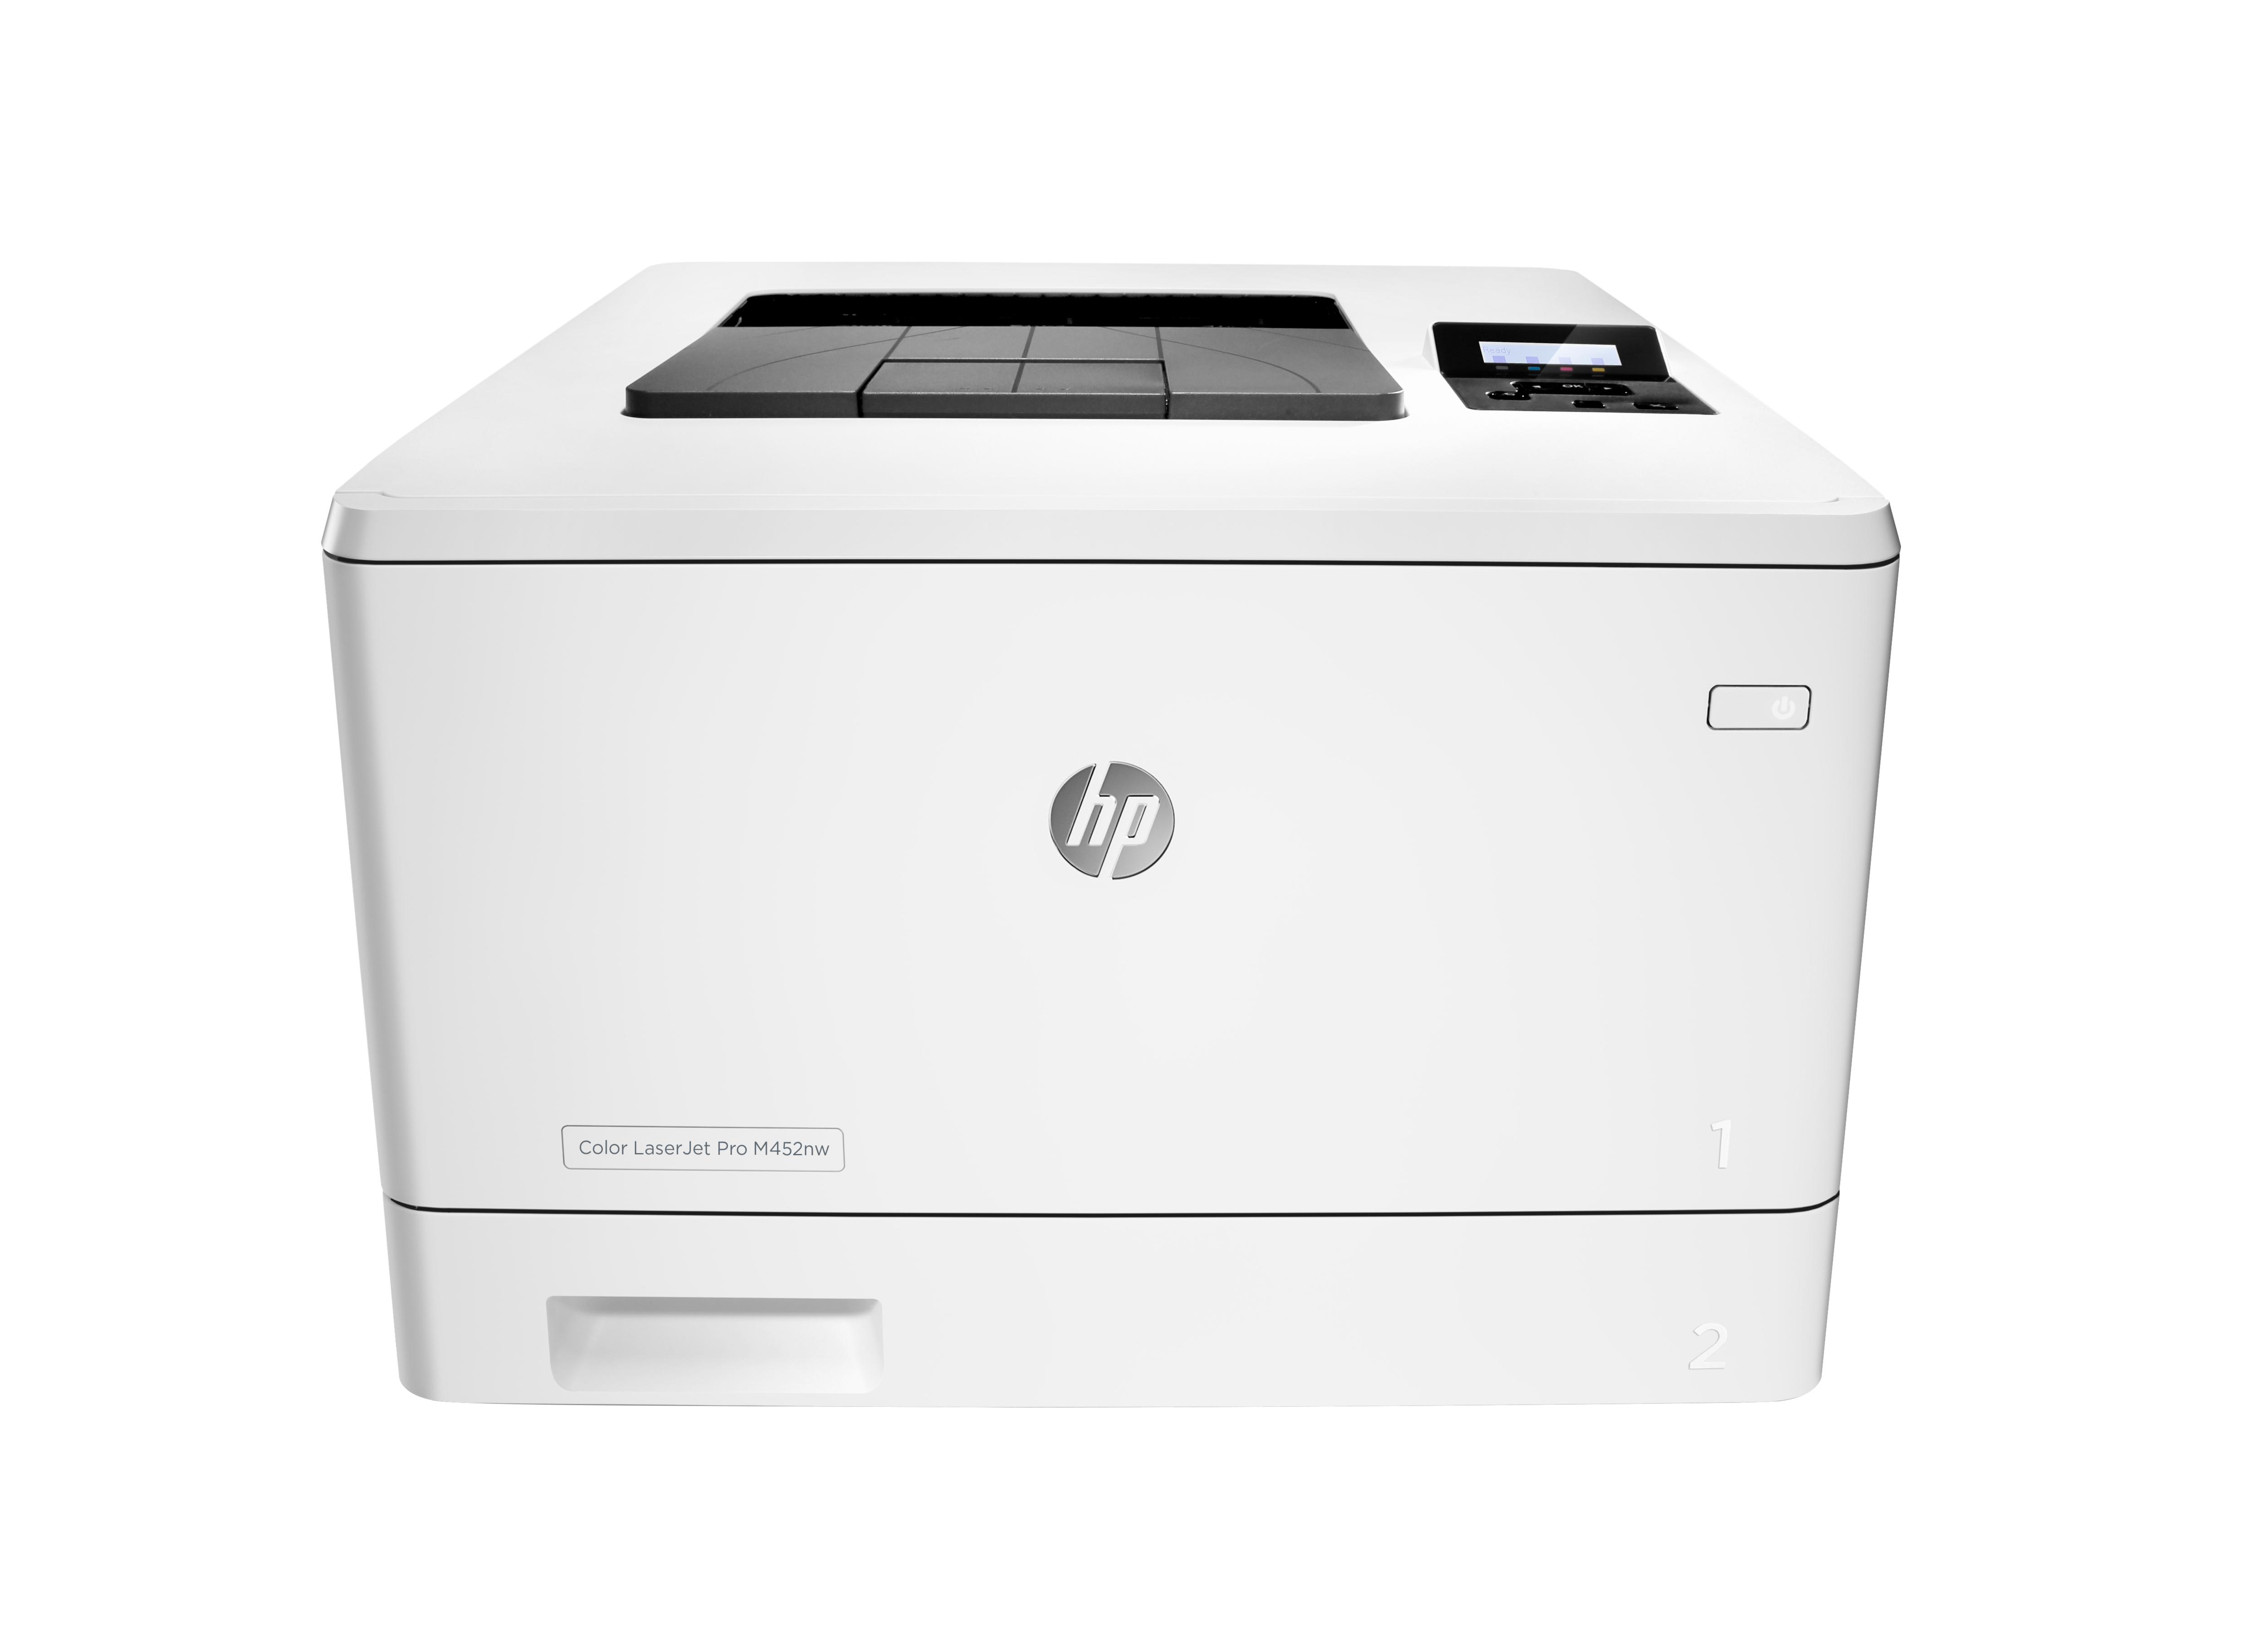 HP Color LaserJet Pro M452nw, Farblaser, A4